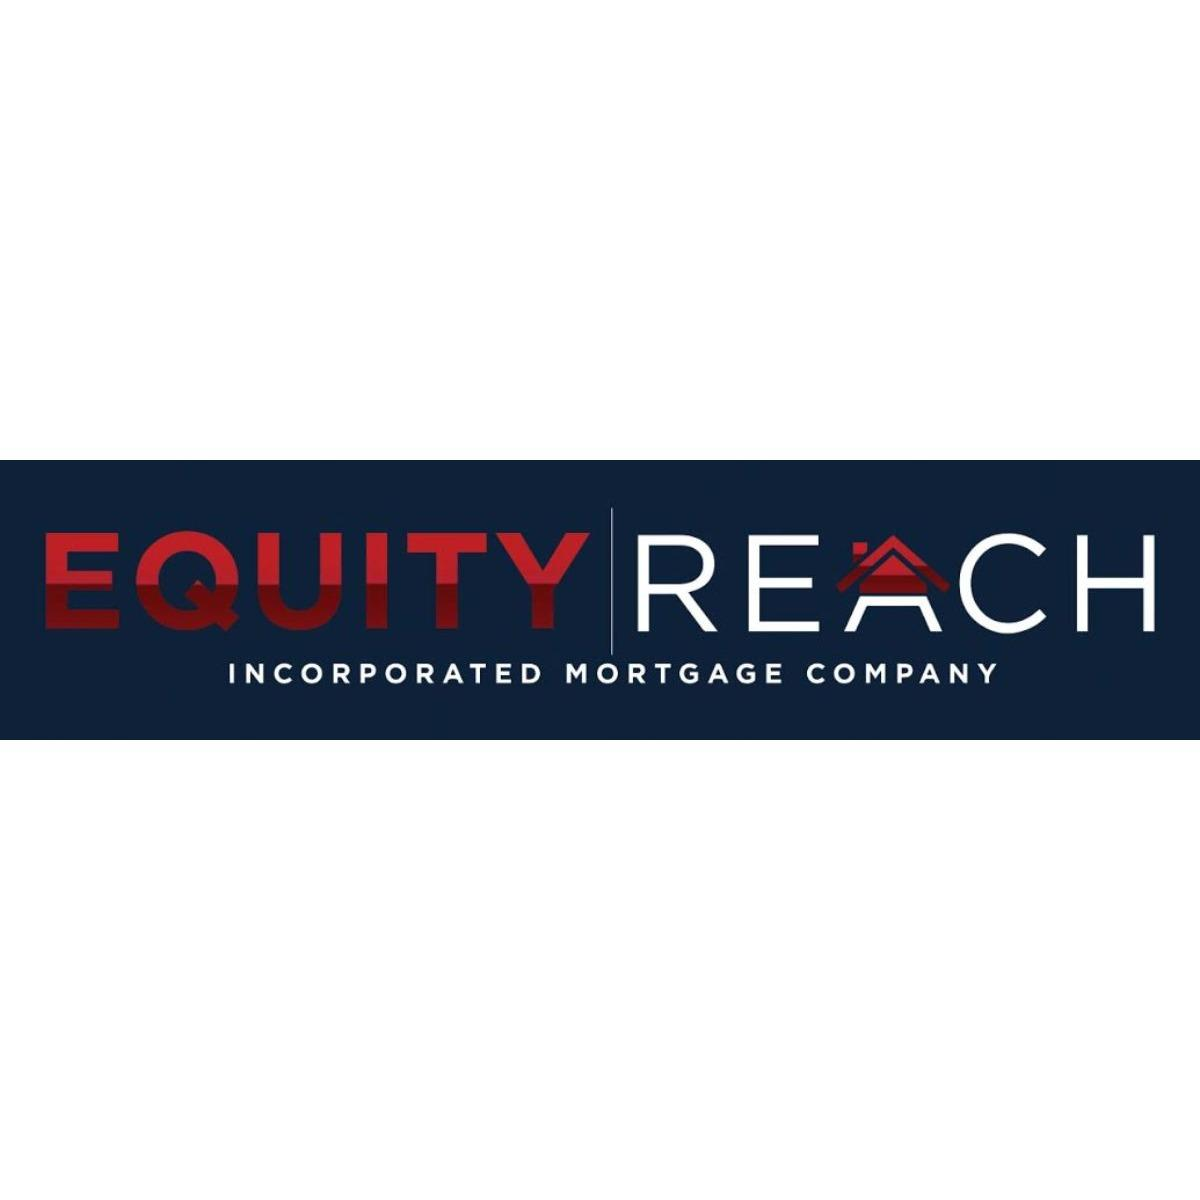 Equity Reach Inc.